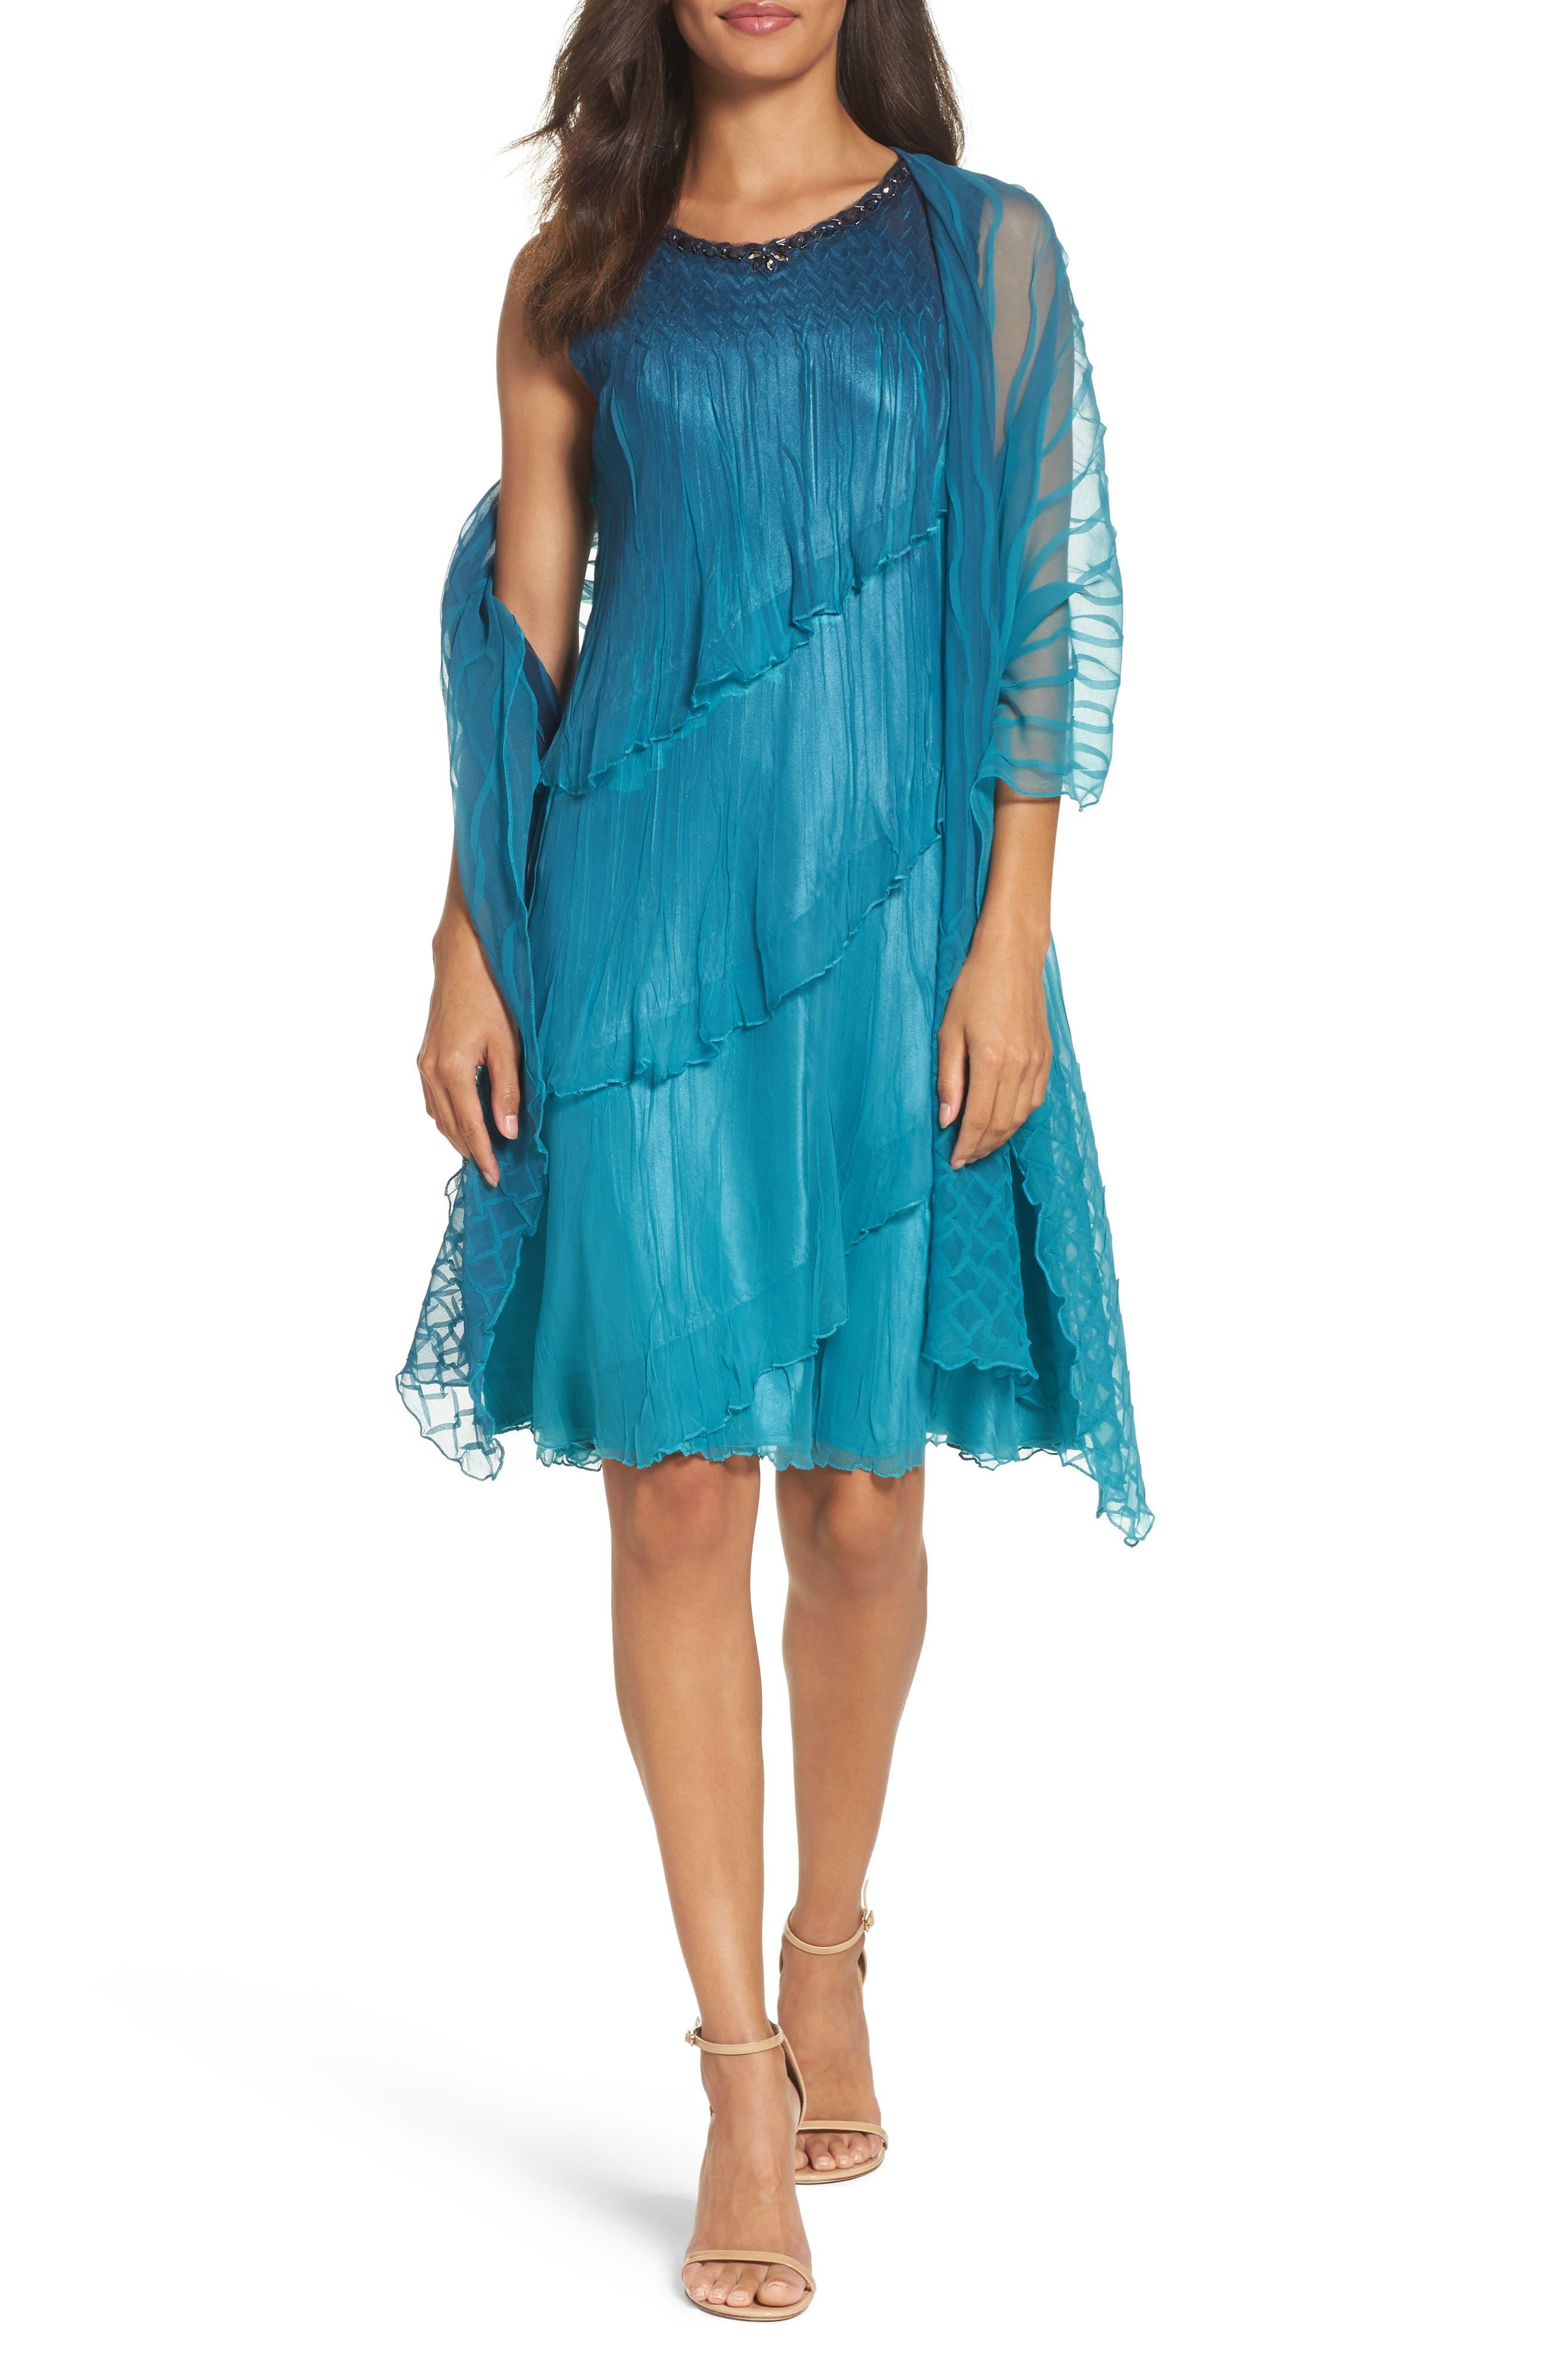 Tiered Chiffon Shift Dress with Shawl,                             Alternate thumbnail 5, color,                             491